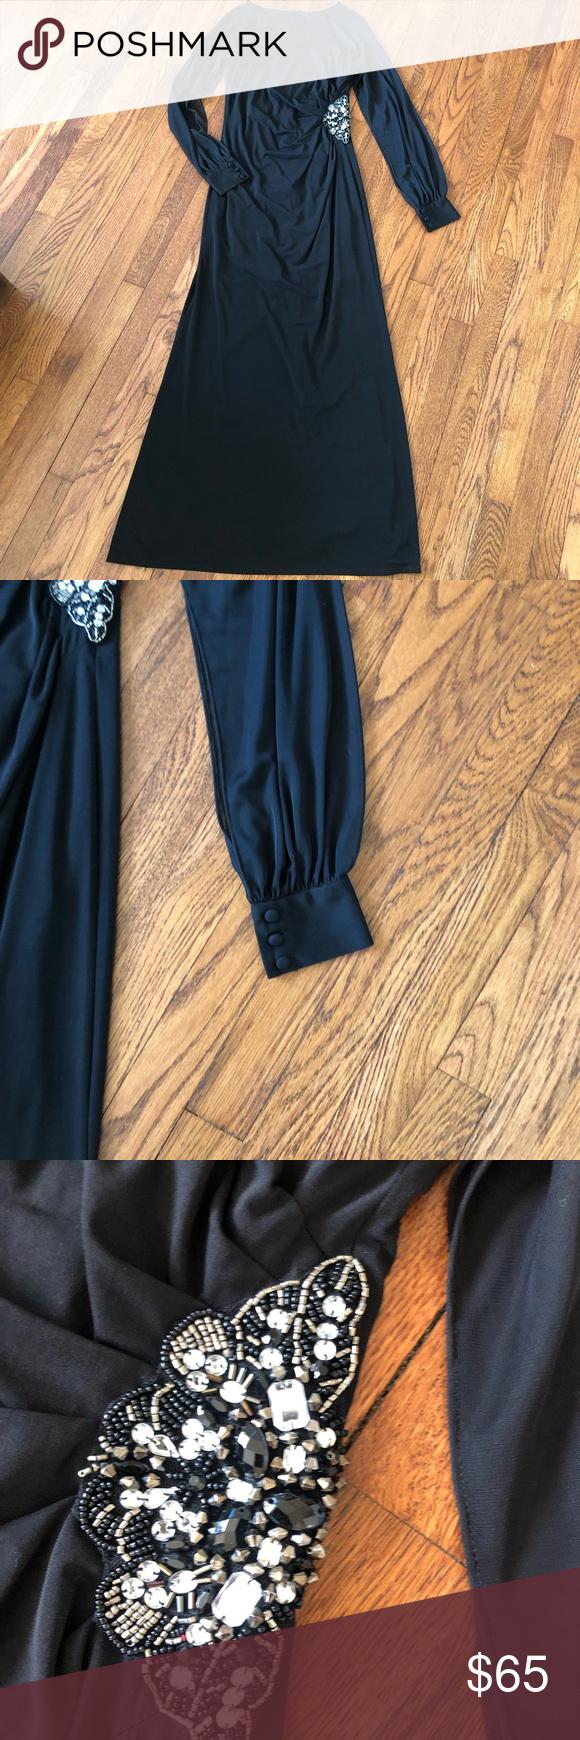 e7e5742f988 Eliza j black long sleeve gown Eliza j Black long sleeve gown Sleeves are  sheer Zipper